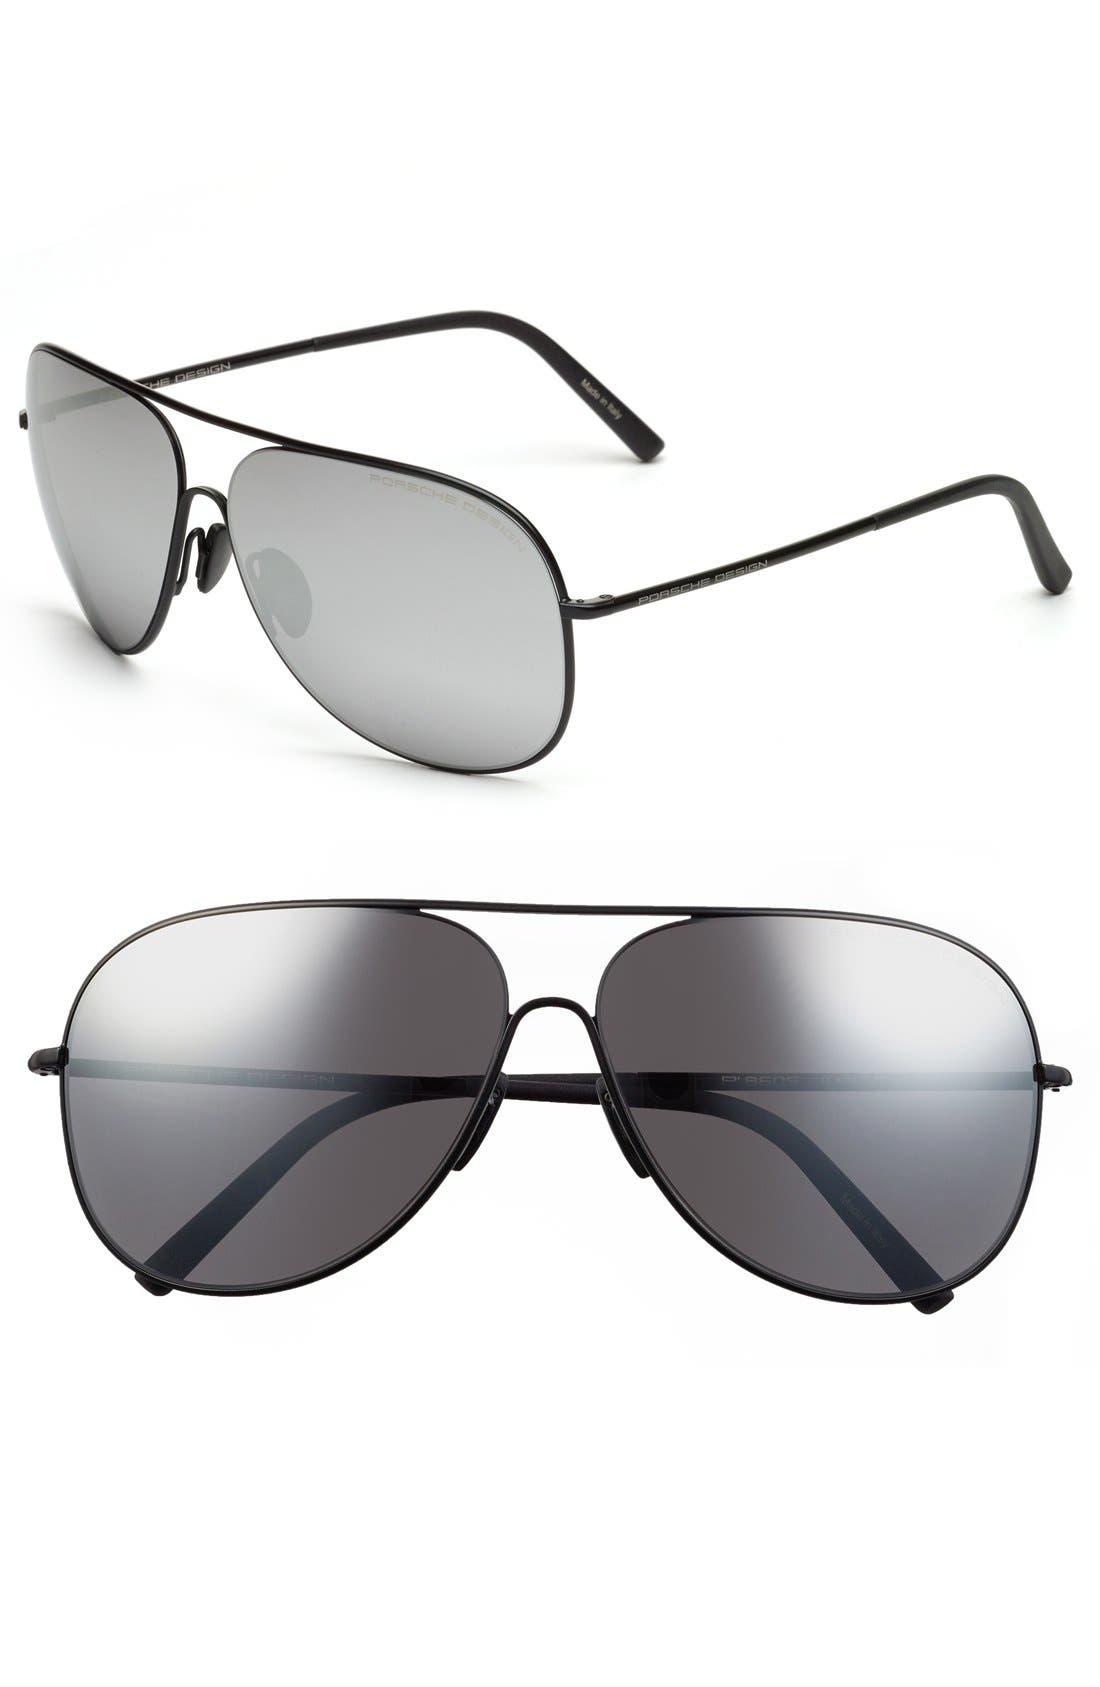 PORSCHE DESIGN 'P8605' 64mm Aviator Sunglasses